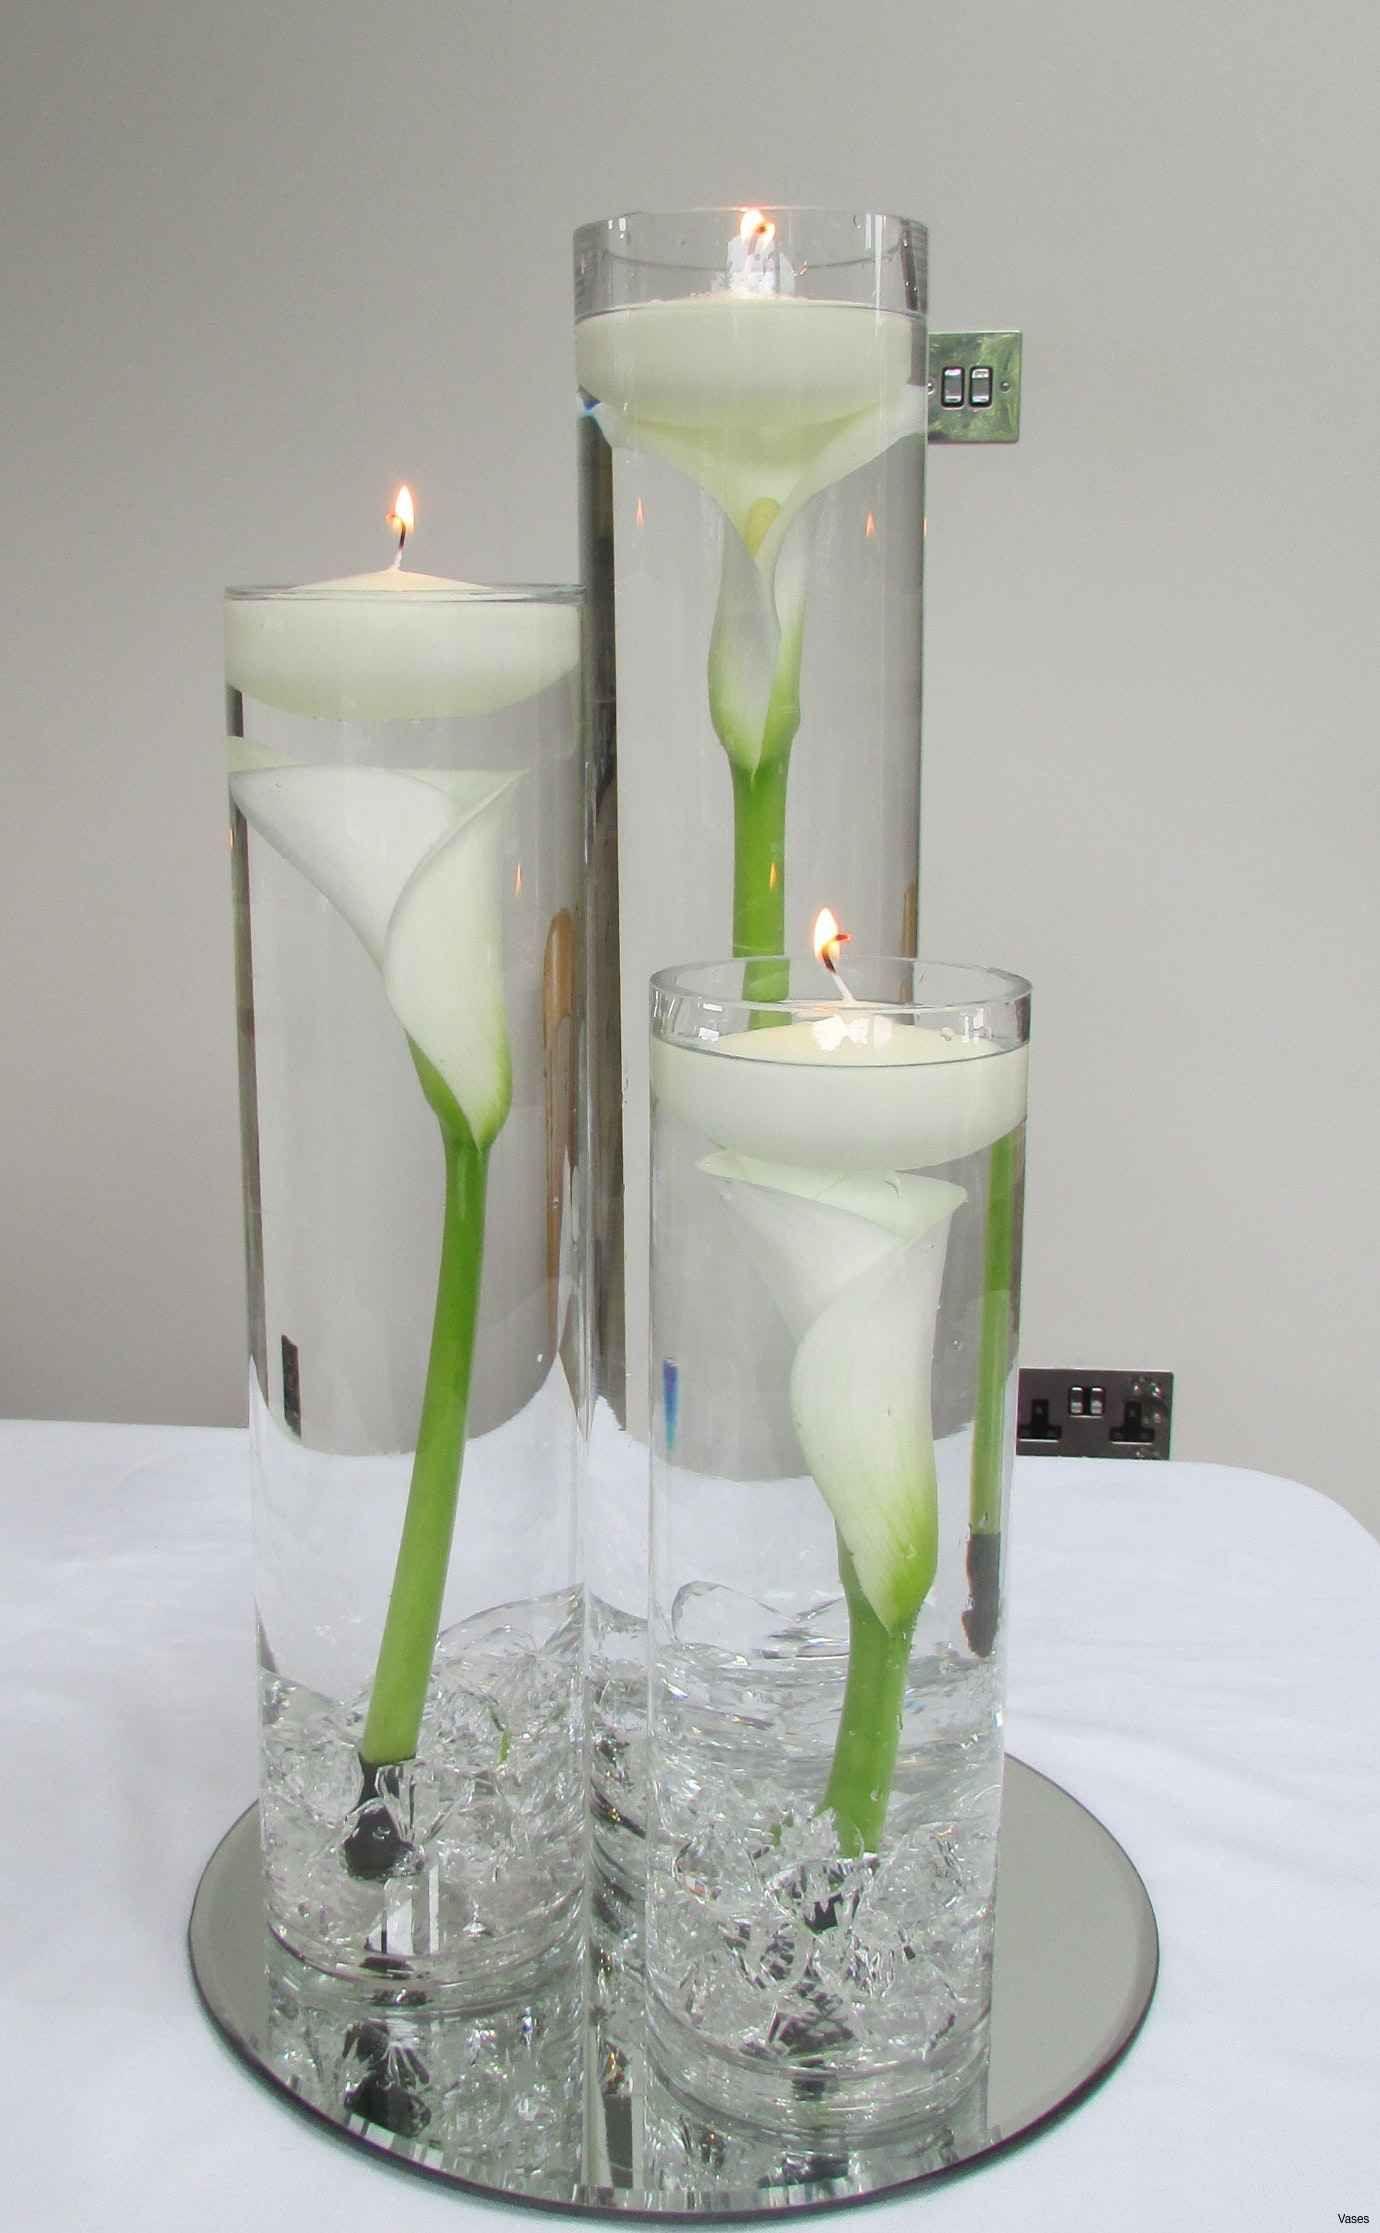 diy glass vase ideas of 34 gold mercury glass vases the weekly world regarding vases floating candle vase set glass holdersi 0d centerpieces dollar